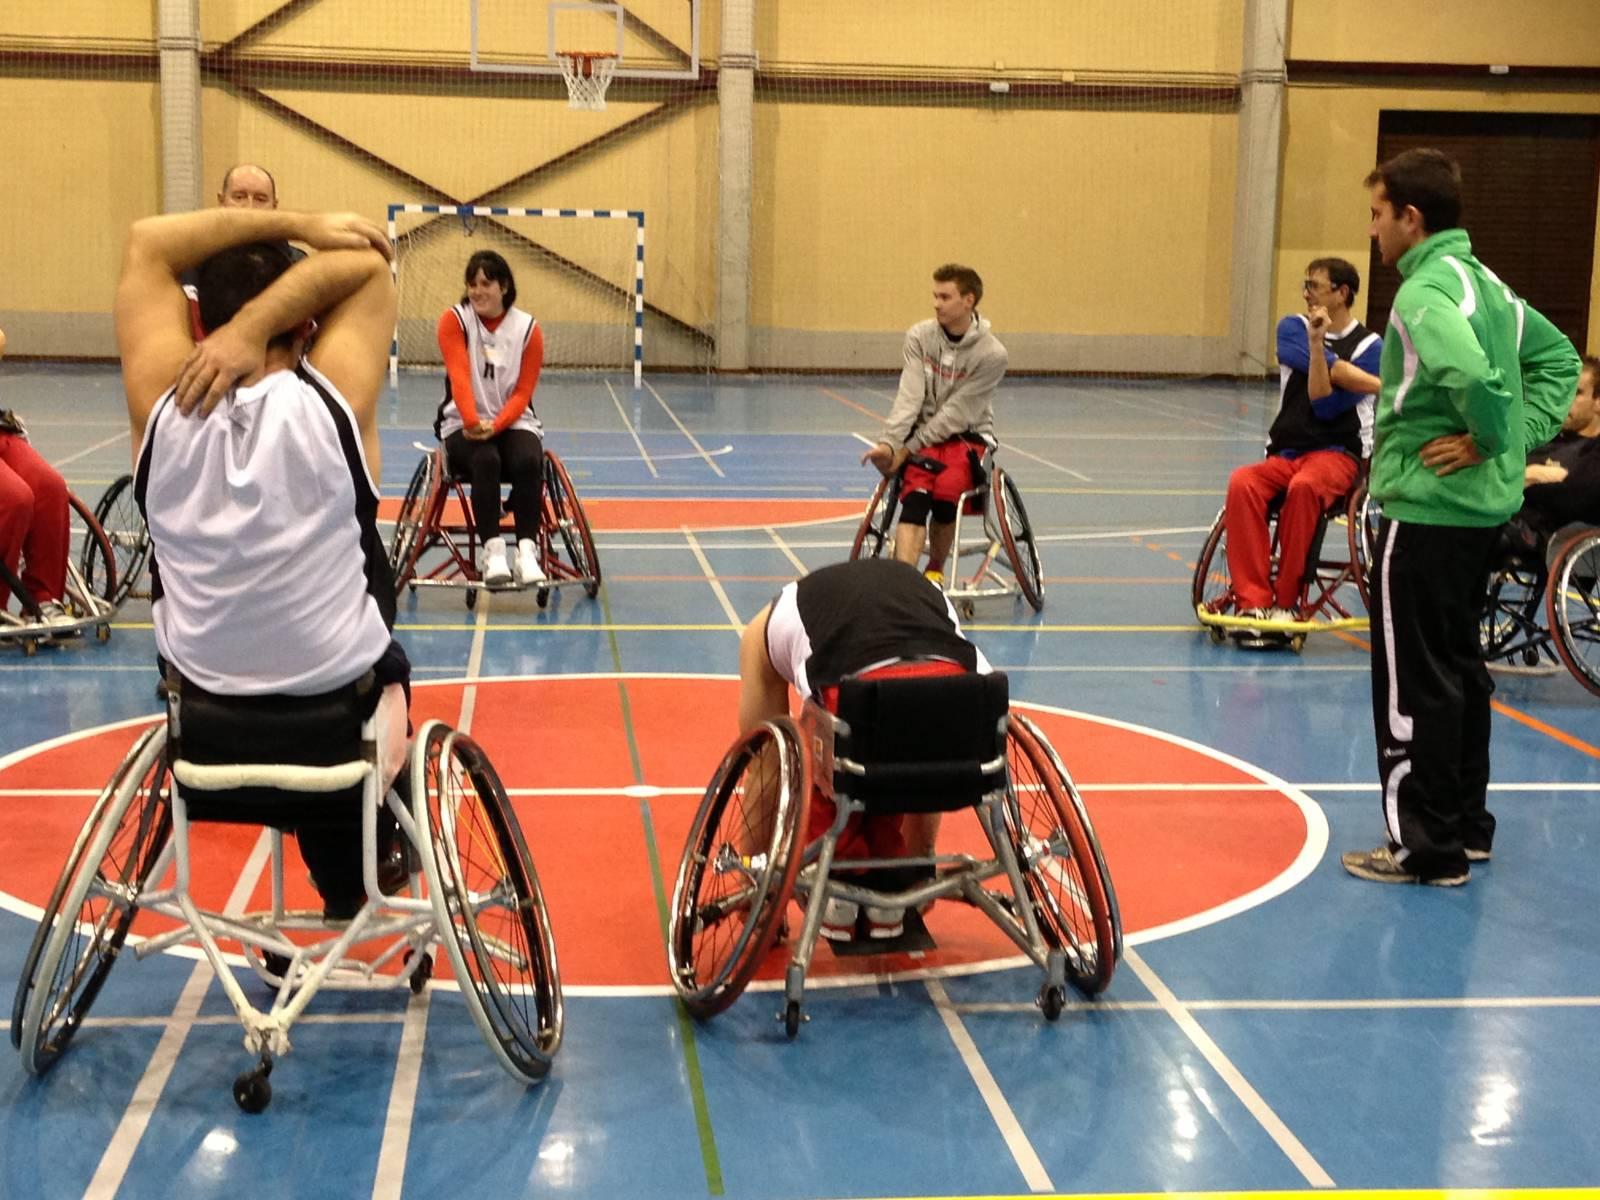 Baloncesto en silla de ruedas Madril nea